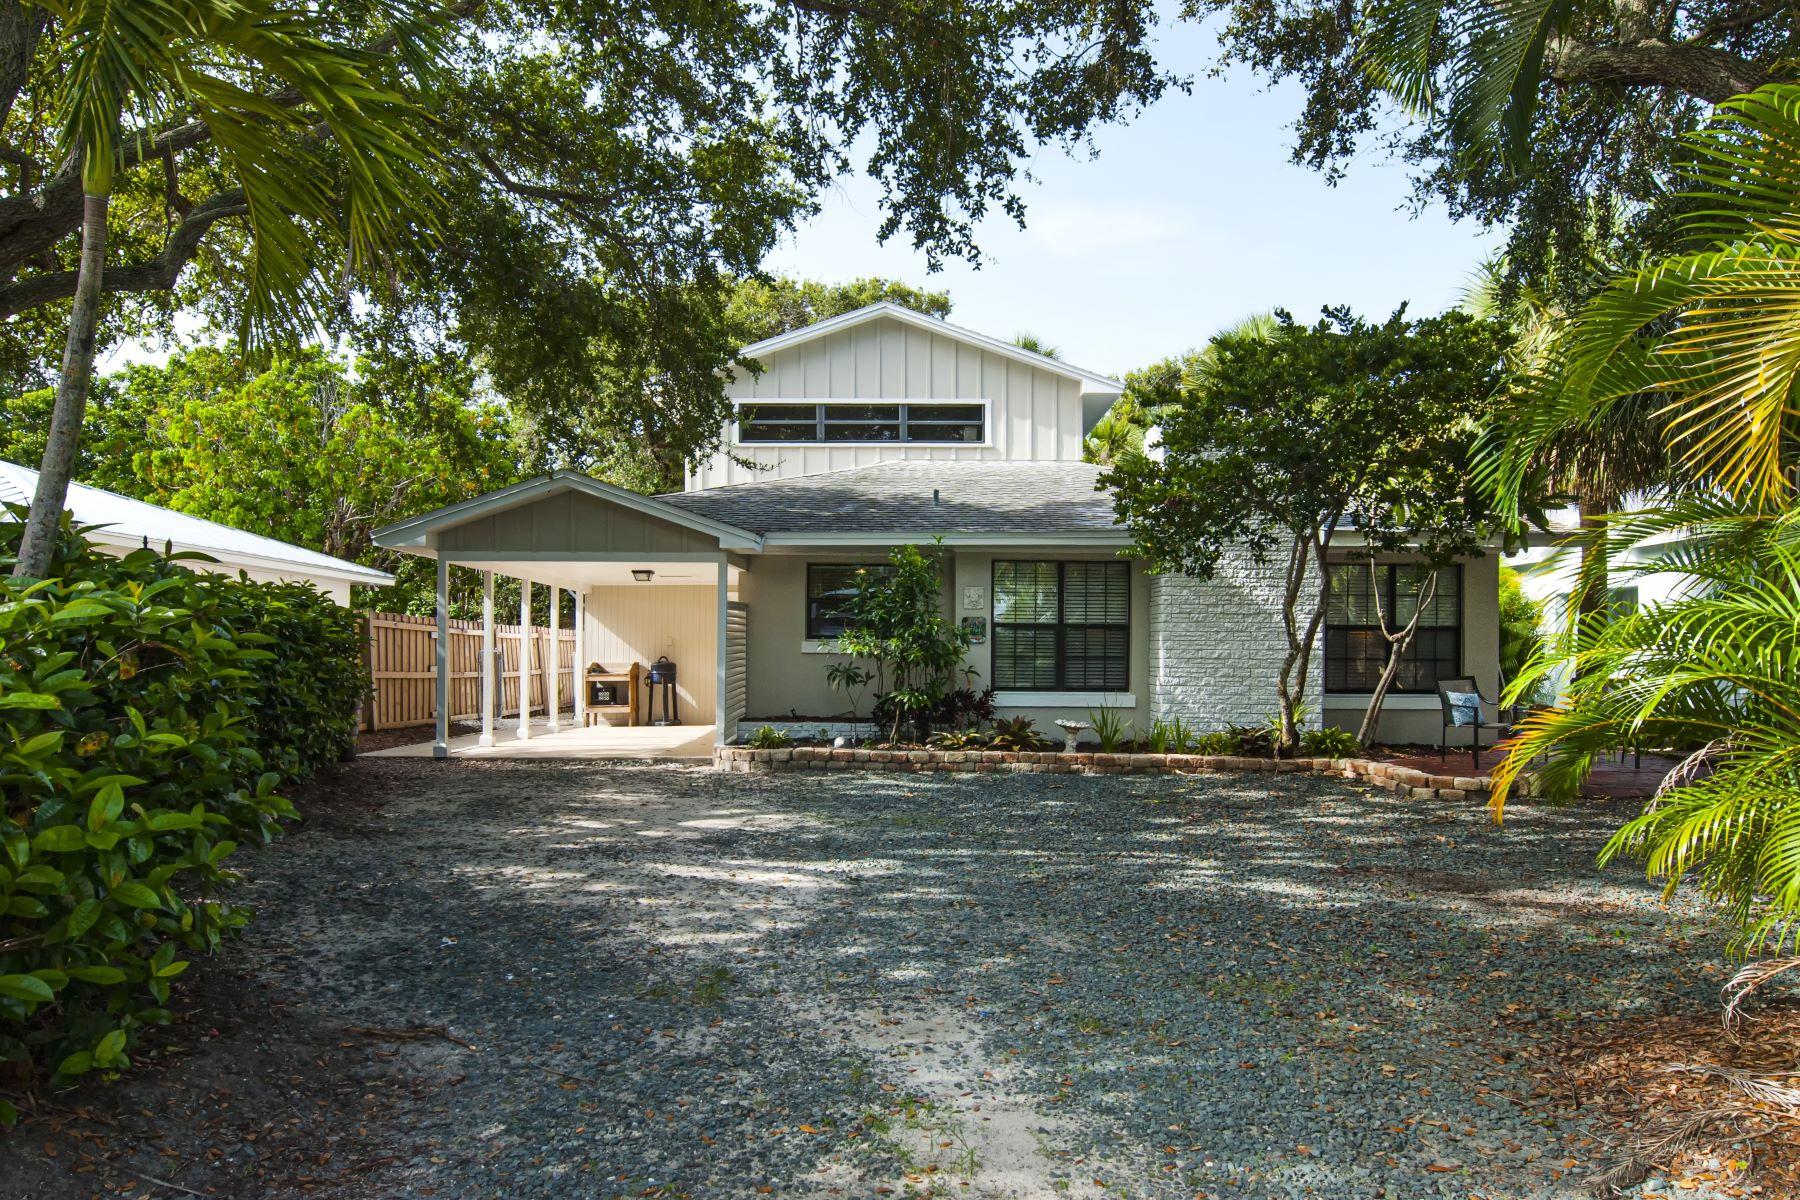 754 Camelia Lane, Vero Beach, FL 754 Camelia Lane Vero Beach, Florida 32963 Stati Uniti